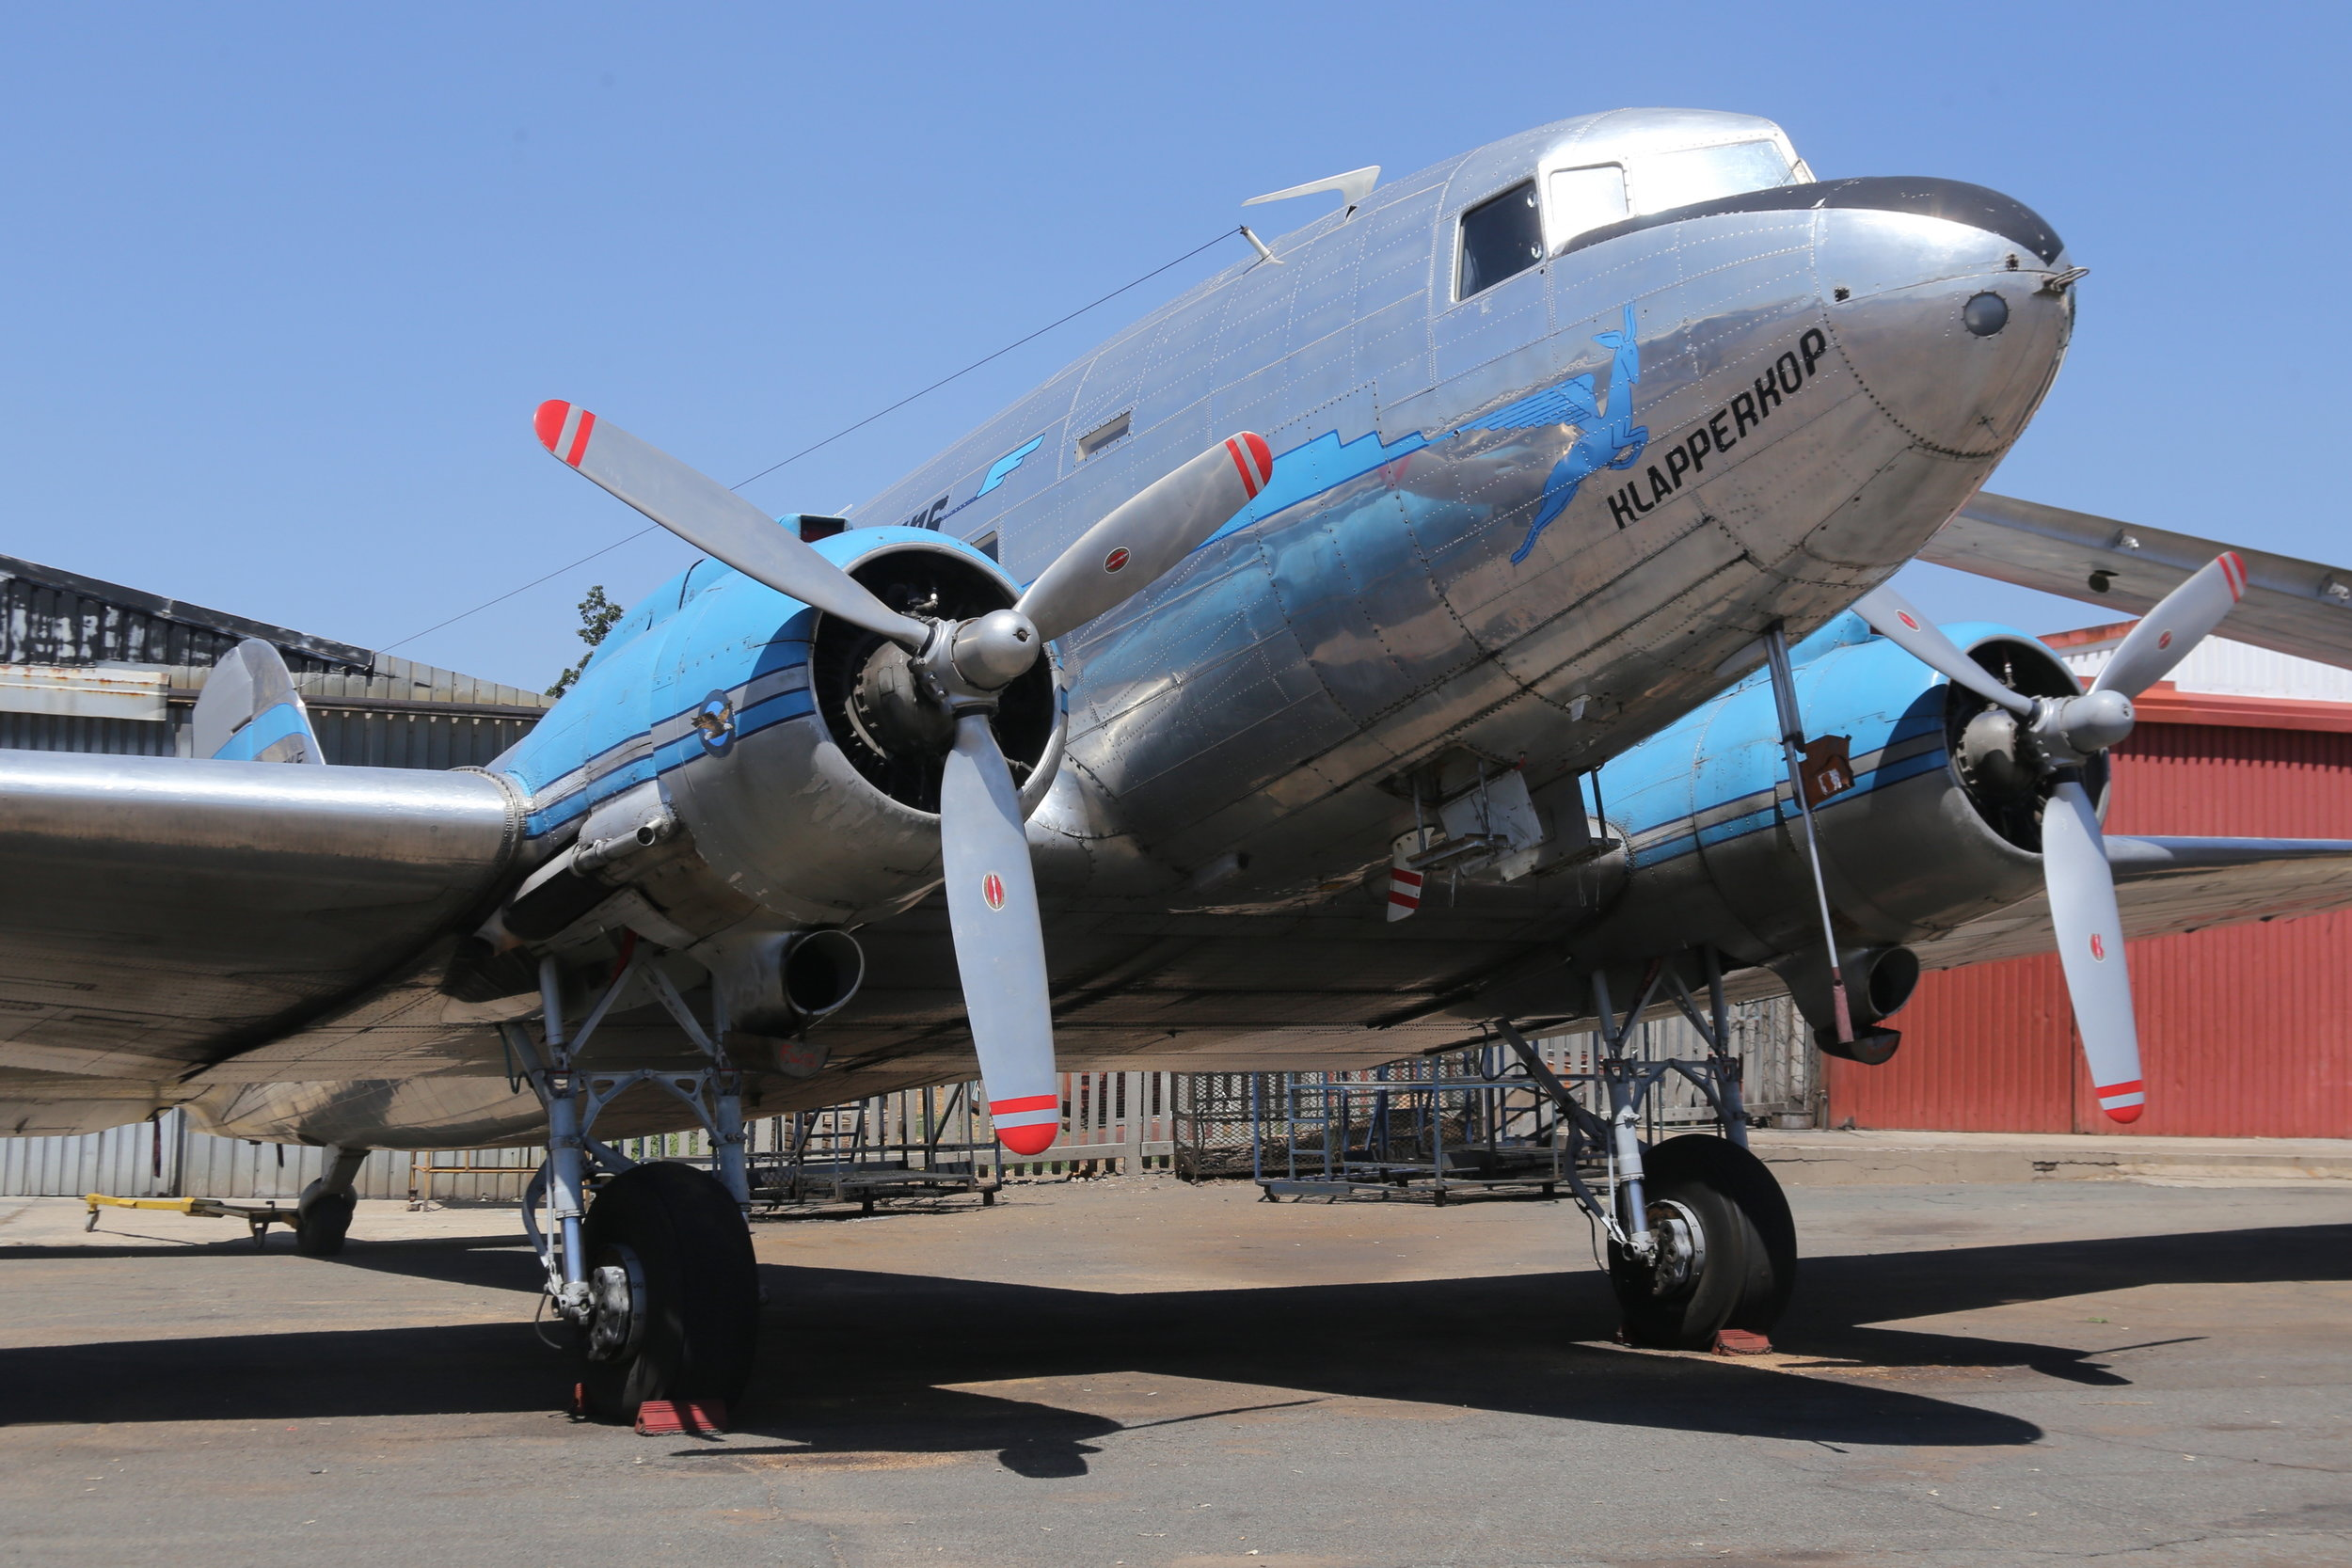 ZS-BXF SAA Historic Flight Douglas C-47A Skytrain taken at Rand 8th November 2018 by John Wood